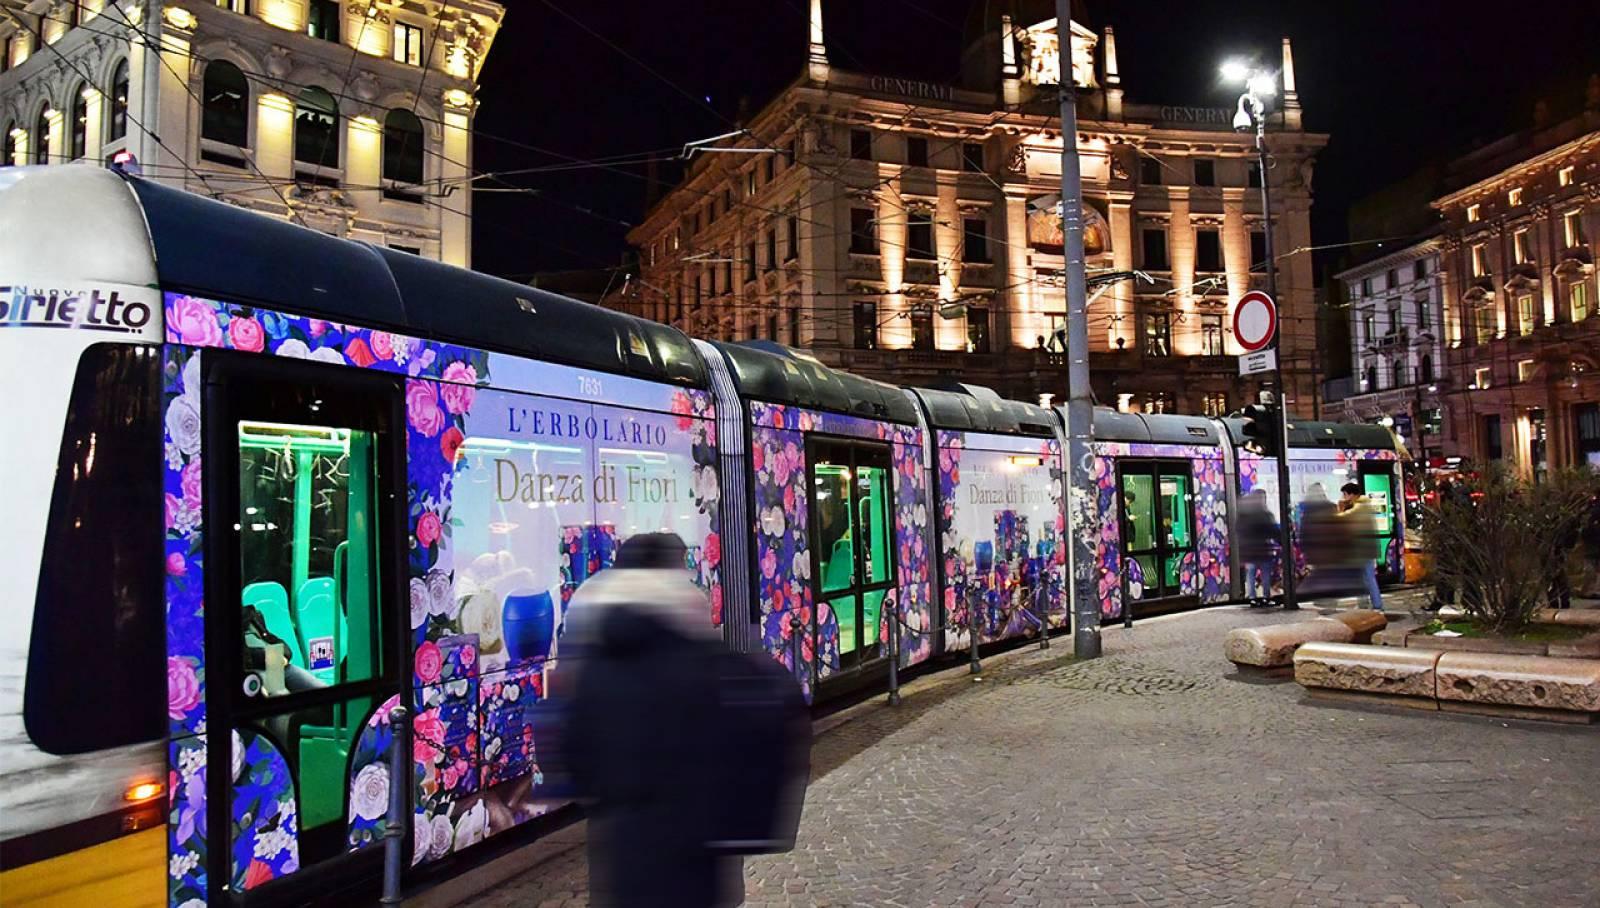 OOH IGPDecaux a Milano tram decorato per L'Erbolario